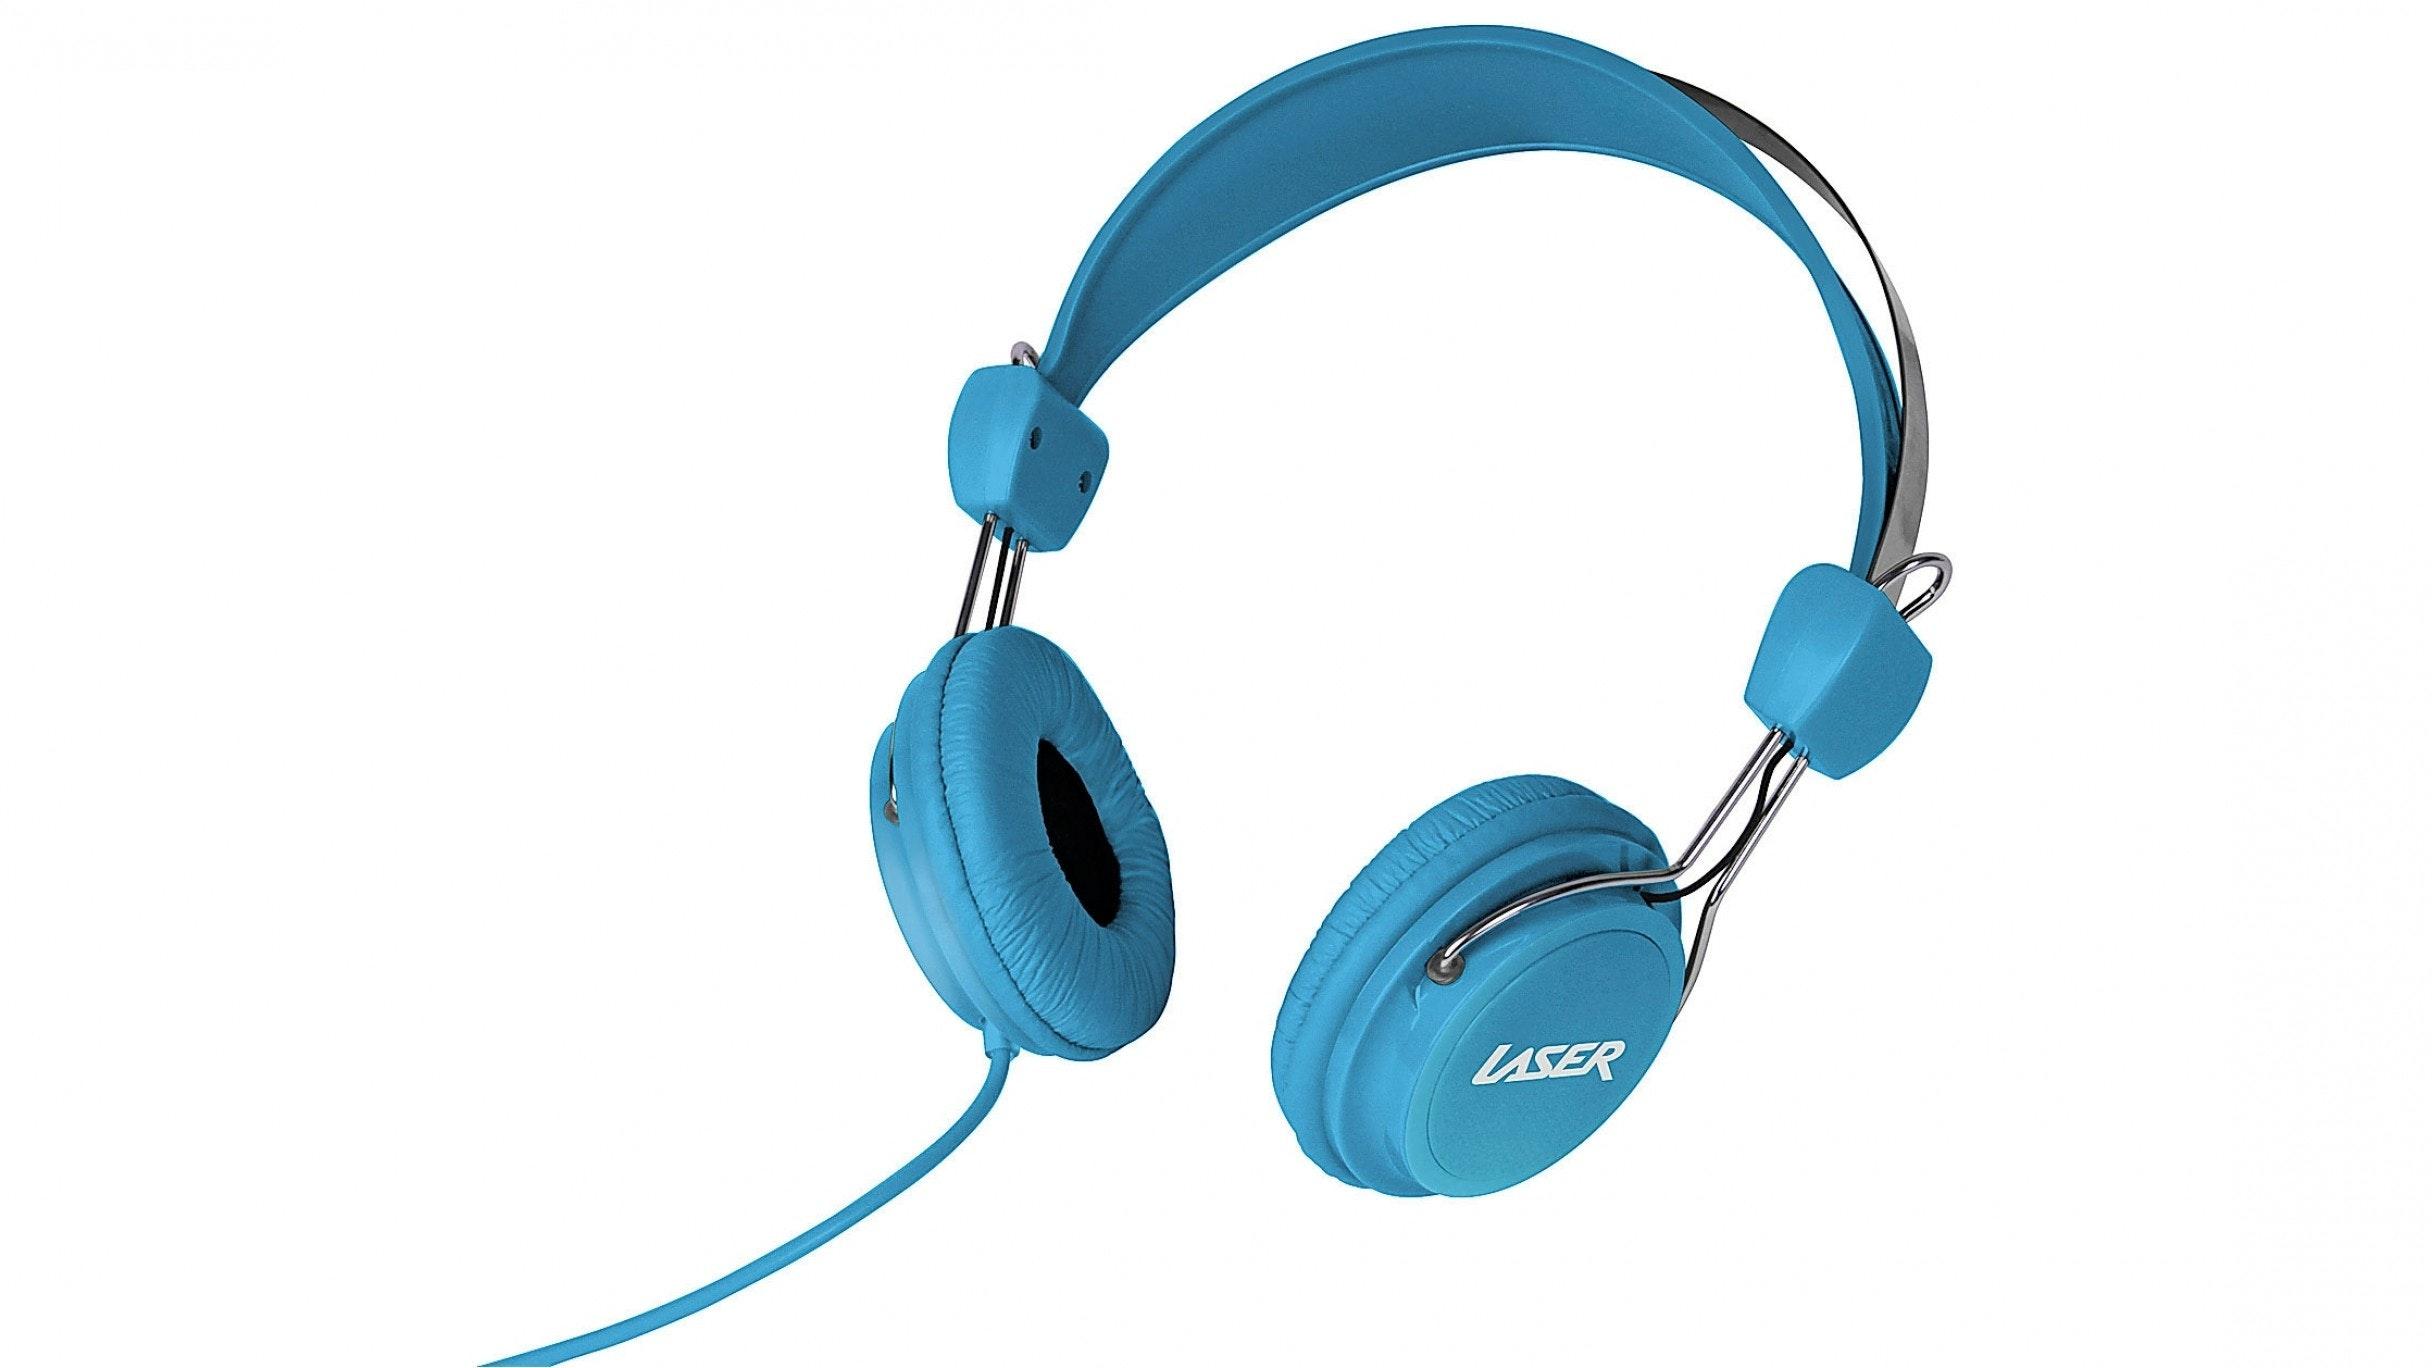 Laser Headphones - Blue